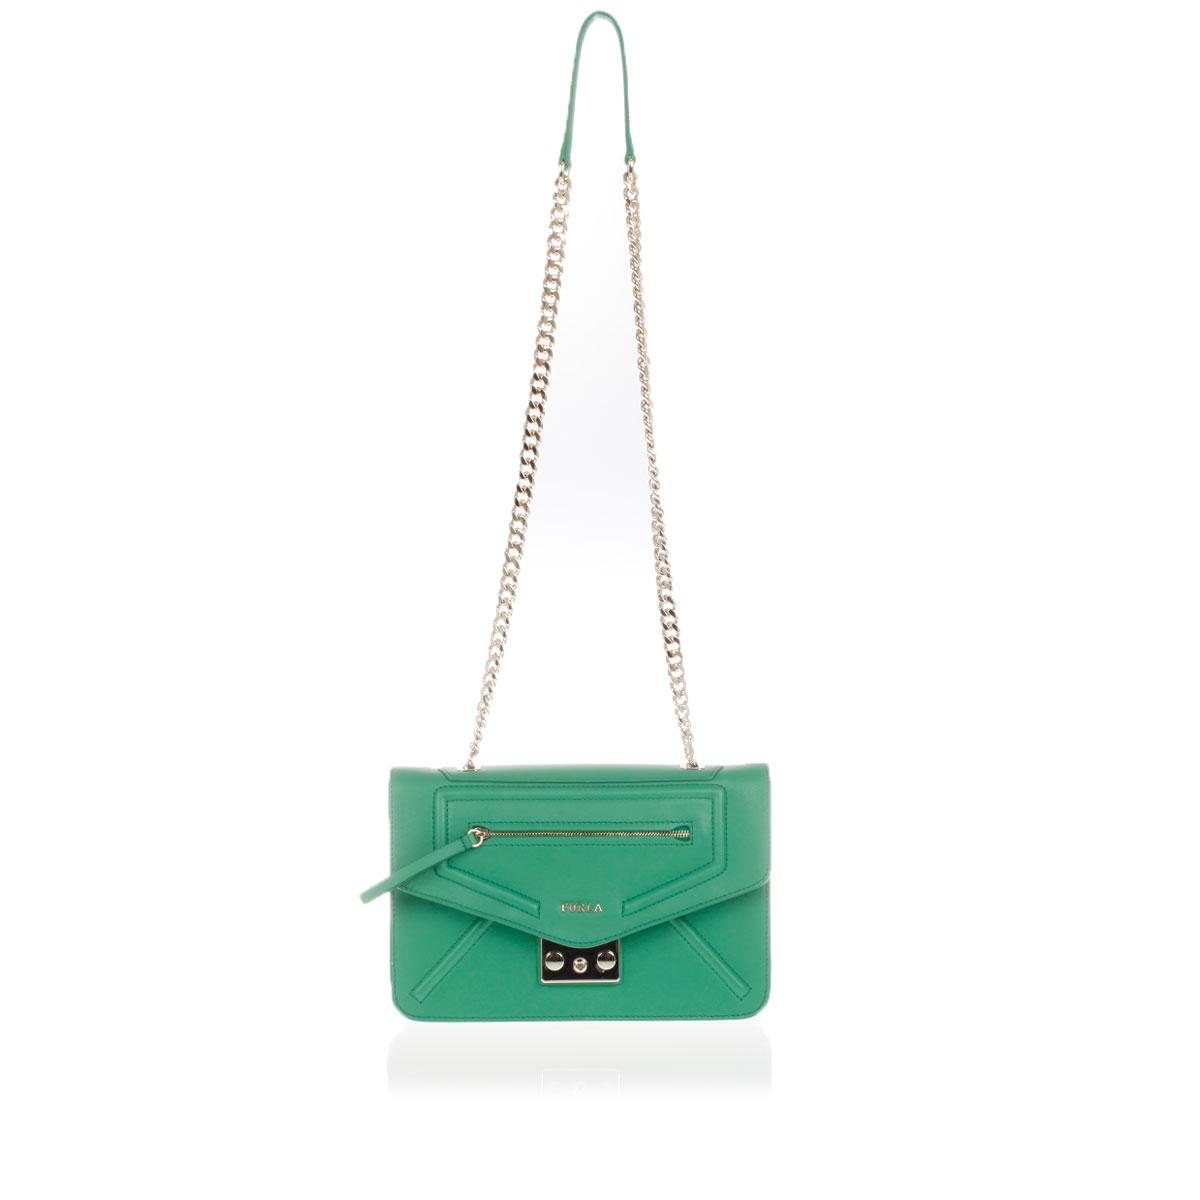 e3f3b1f4ff2 Furla Women ALICE Leather Pochette bag - Glamood Outlet